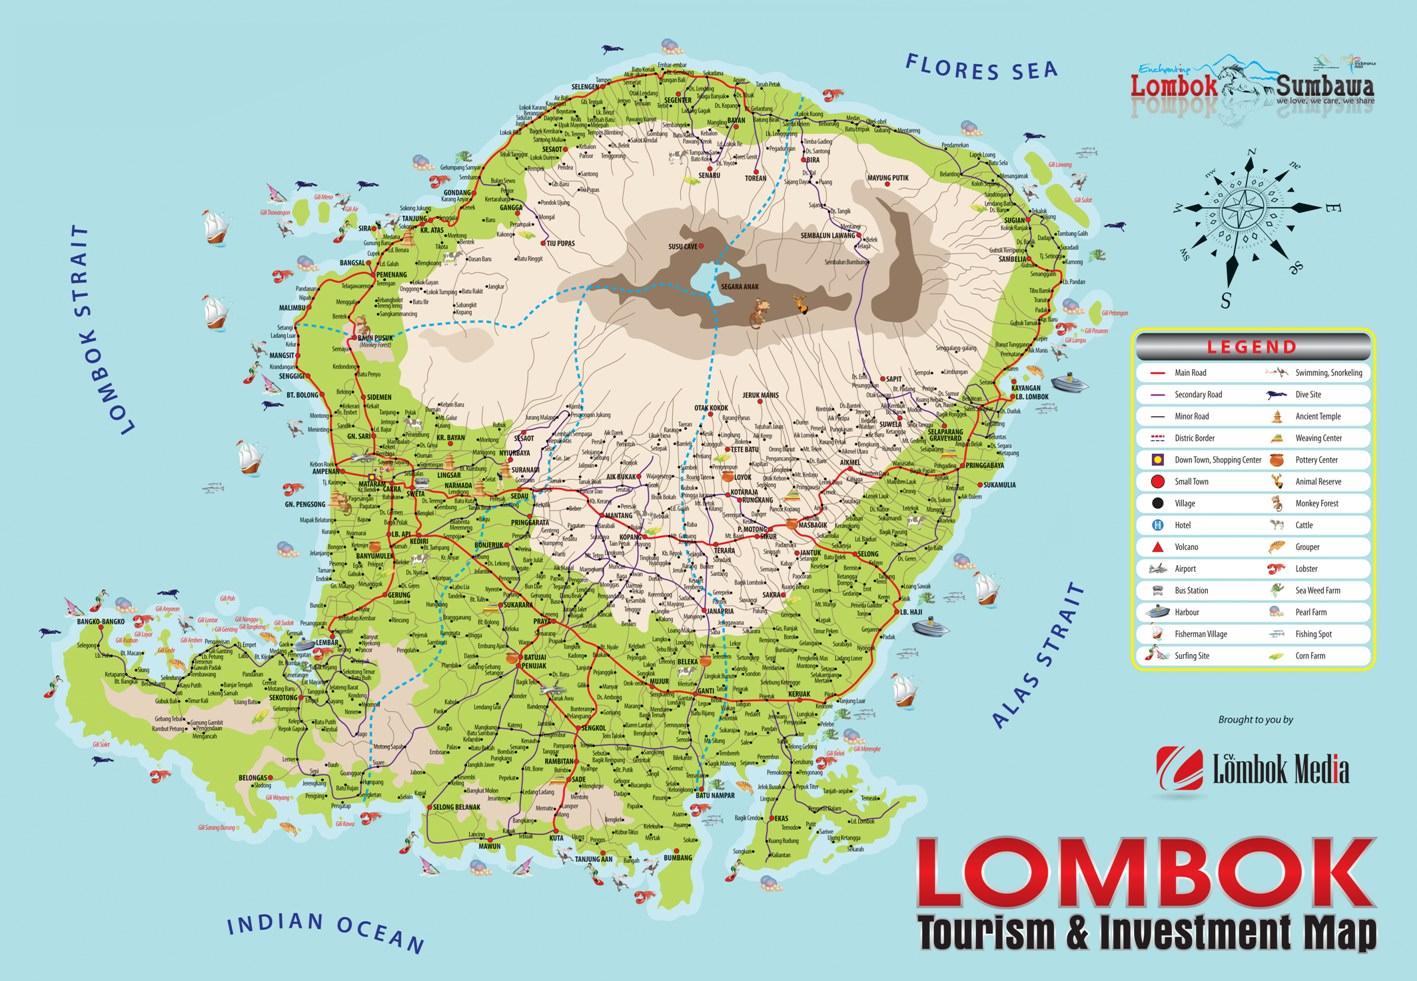 land for sale senggigi beach map of lombok